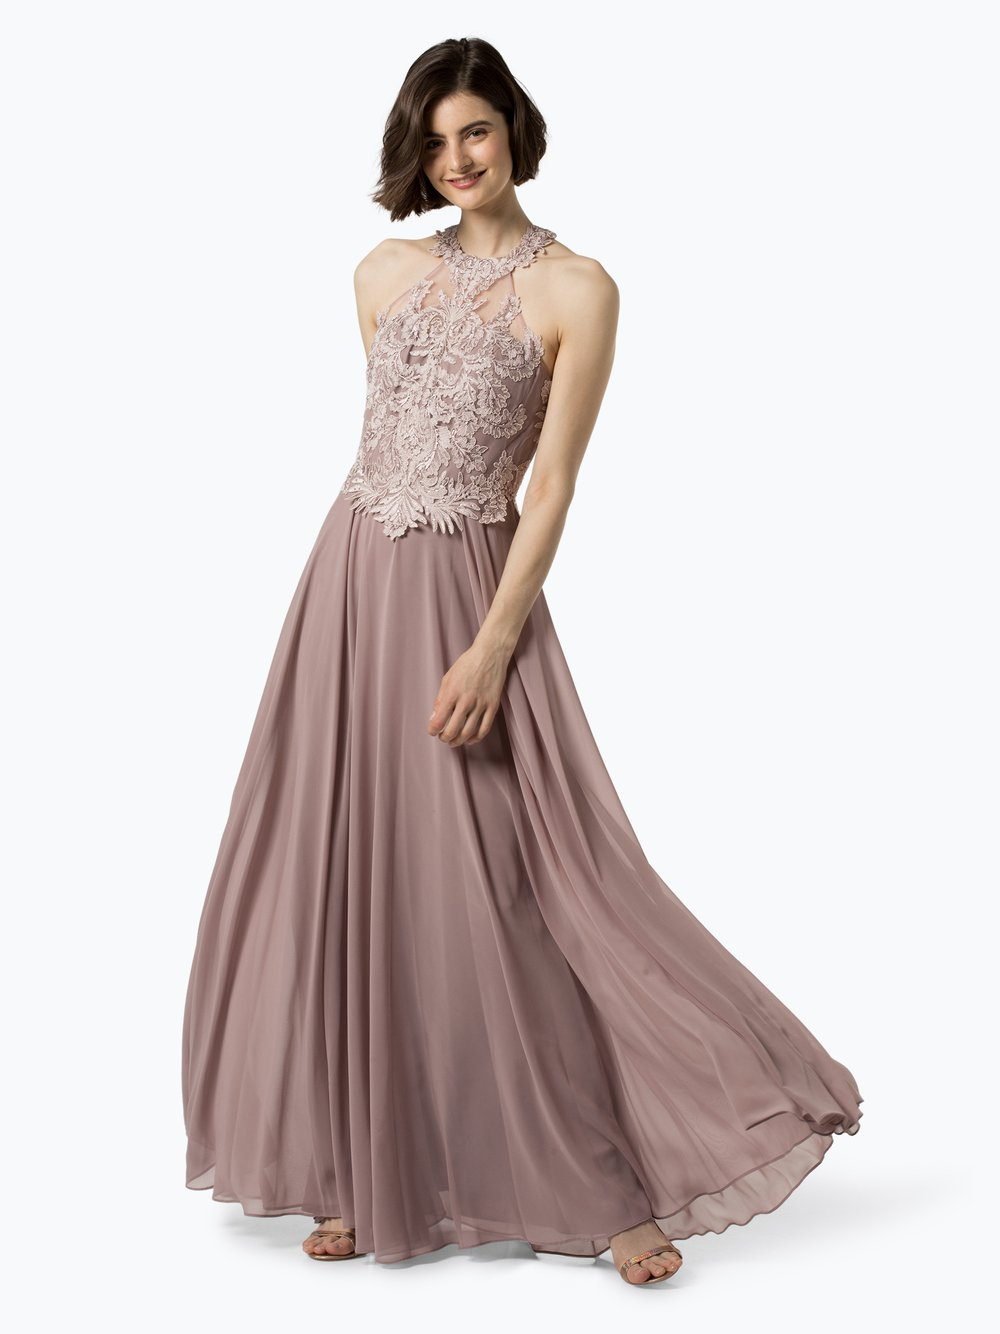 Luxuar Fashion – Damska sukienka wieczorowa, beżowy Van Graaf 433240-0002